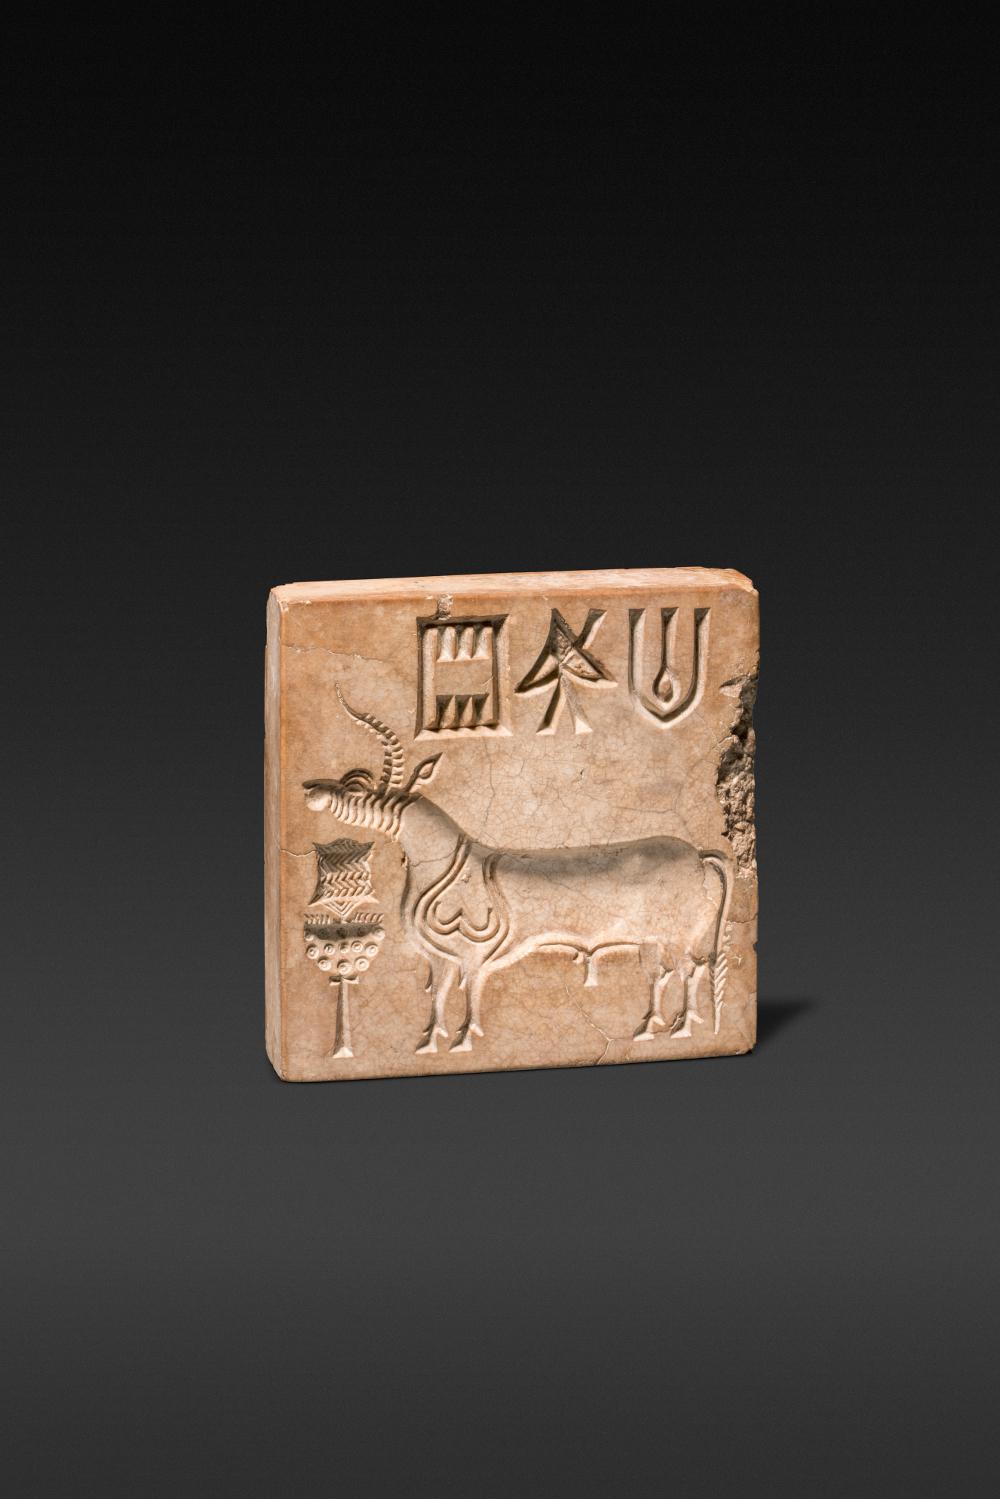 Harappan bull or 'unicorn' seal with censor and 'script' - Steatite2500–2000 BCMohenjodaro, Sindh, PakistanNational Museum, New Delhi